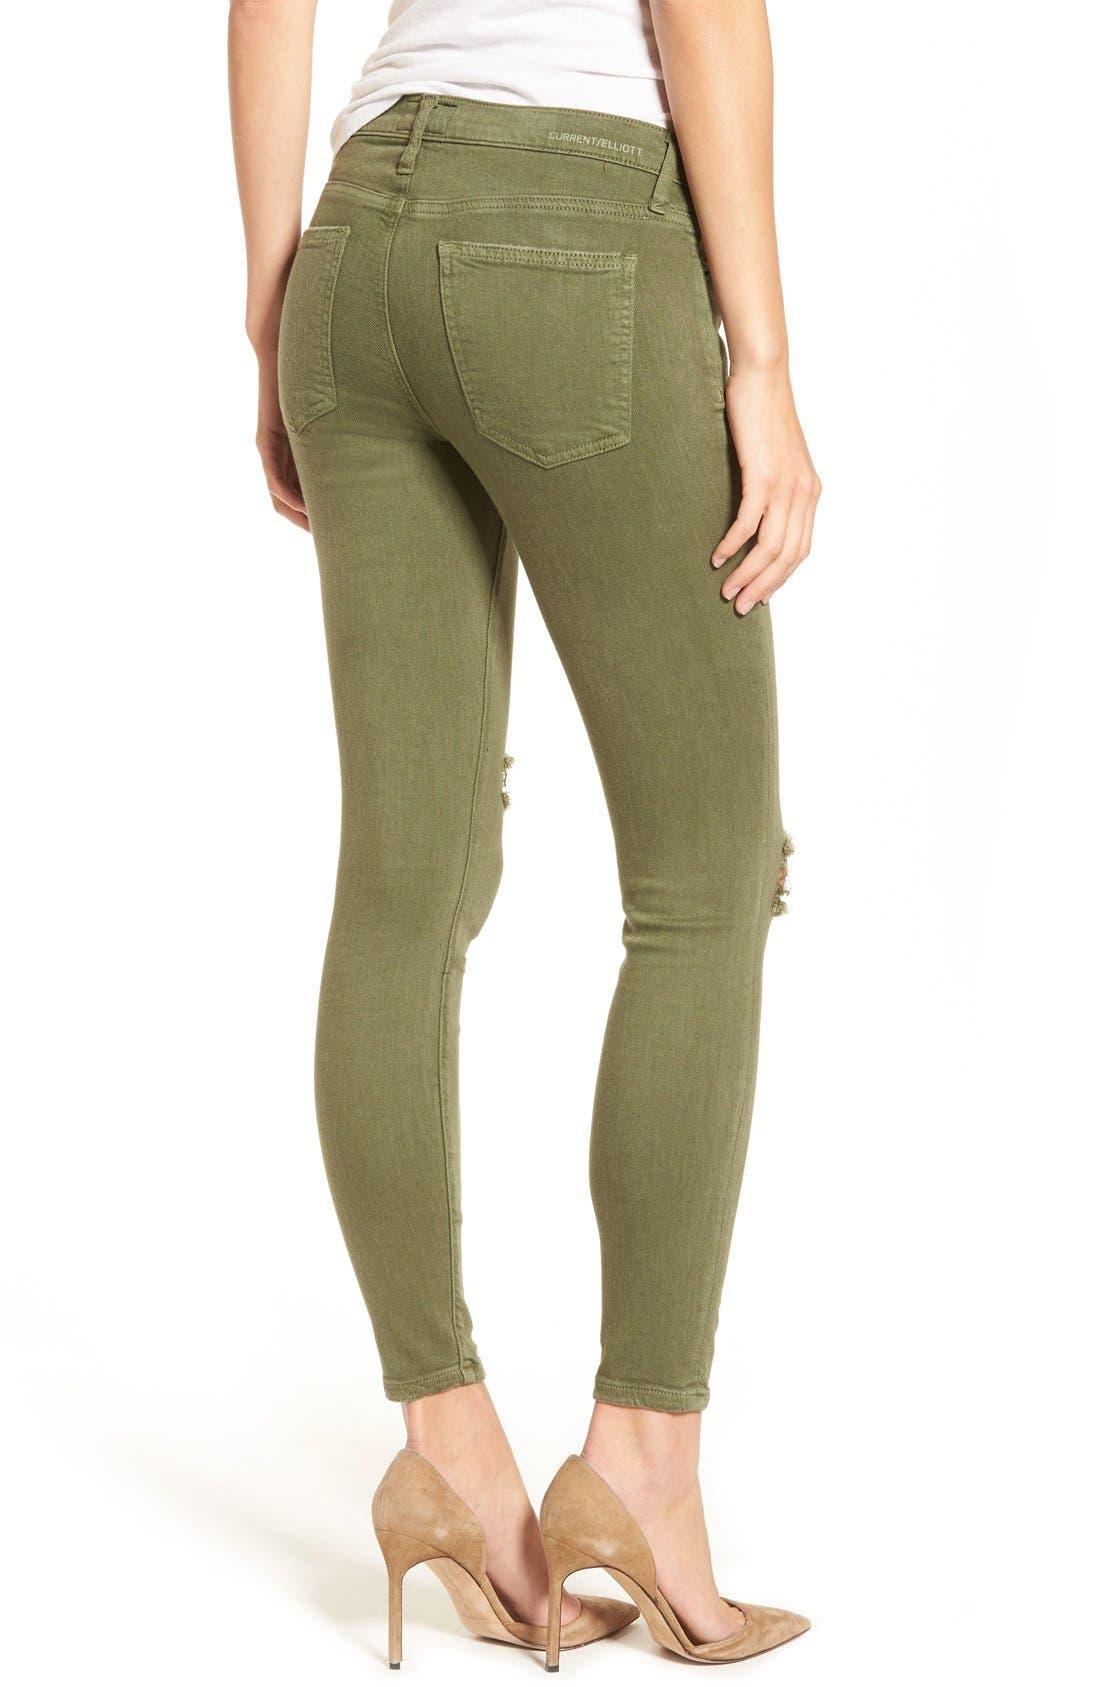 CURRENT/ELLIOTT, 'The Stiletto' Crop Skinny Jeans, Alternate thumbnail 6, color, 309